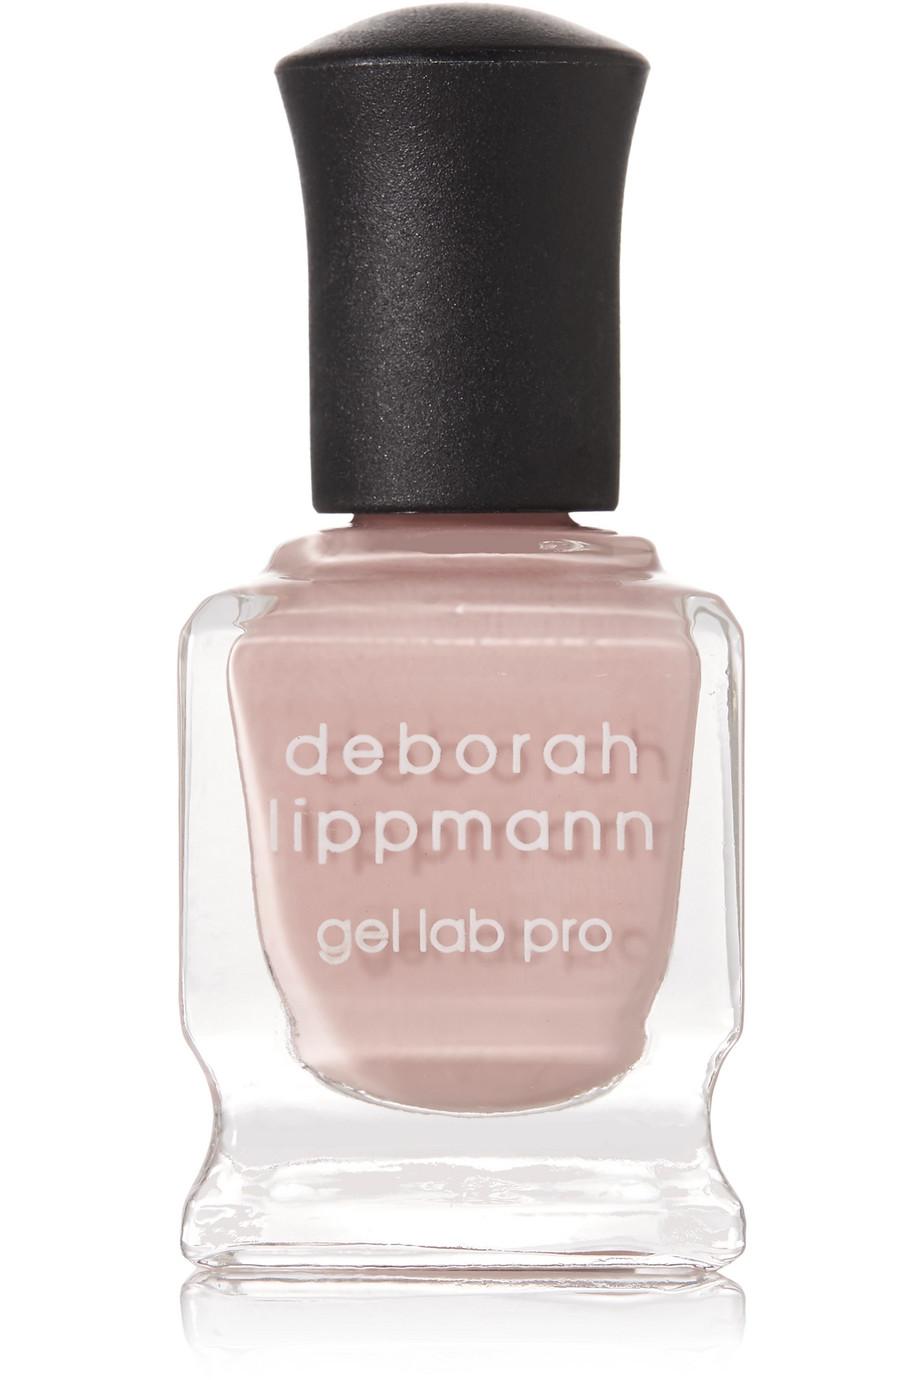 Deborah Lippmann Gel Lab Pro Nail Polish – I'm Too Sexy – Nagellack